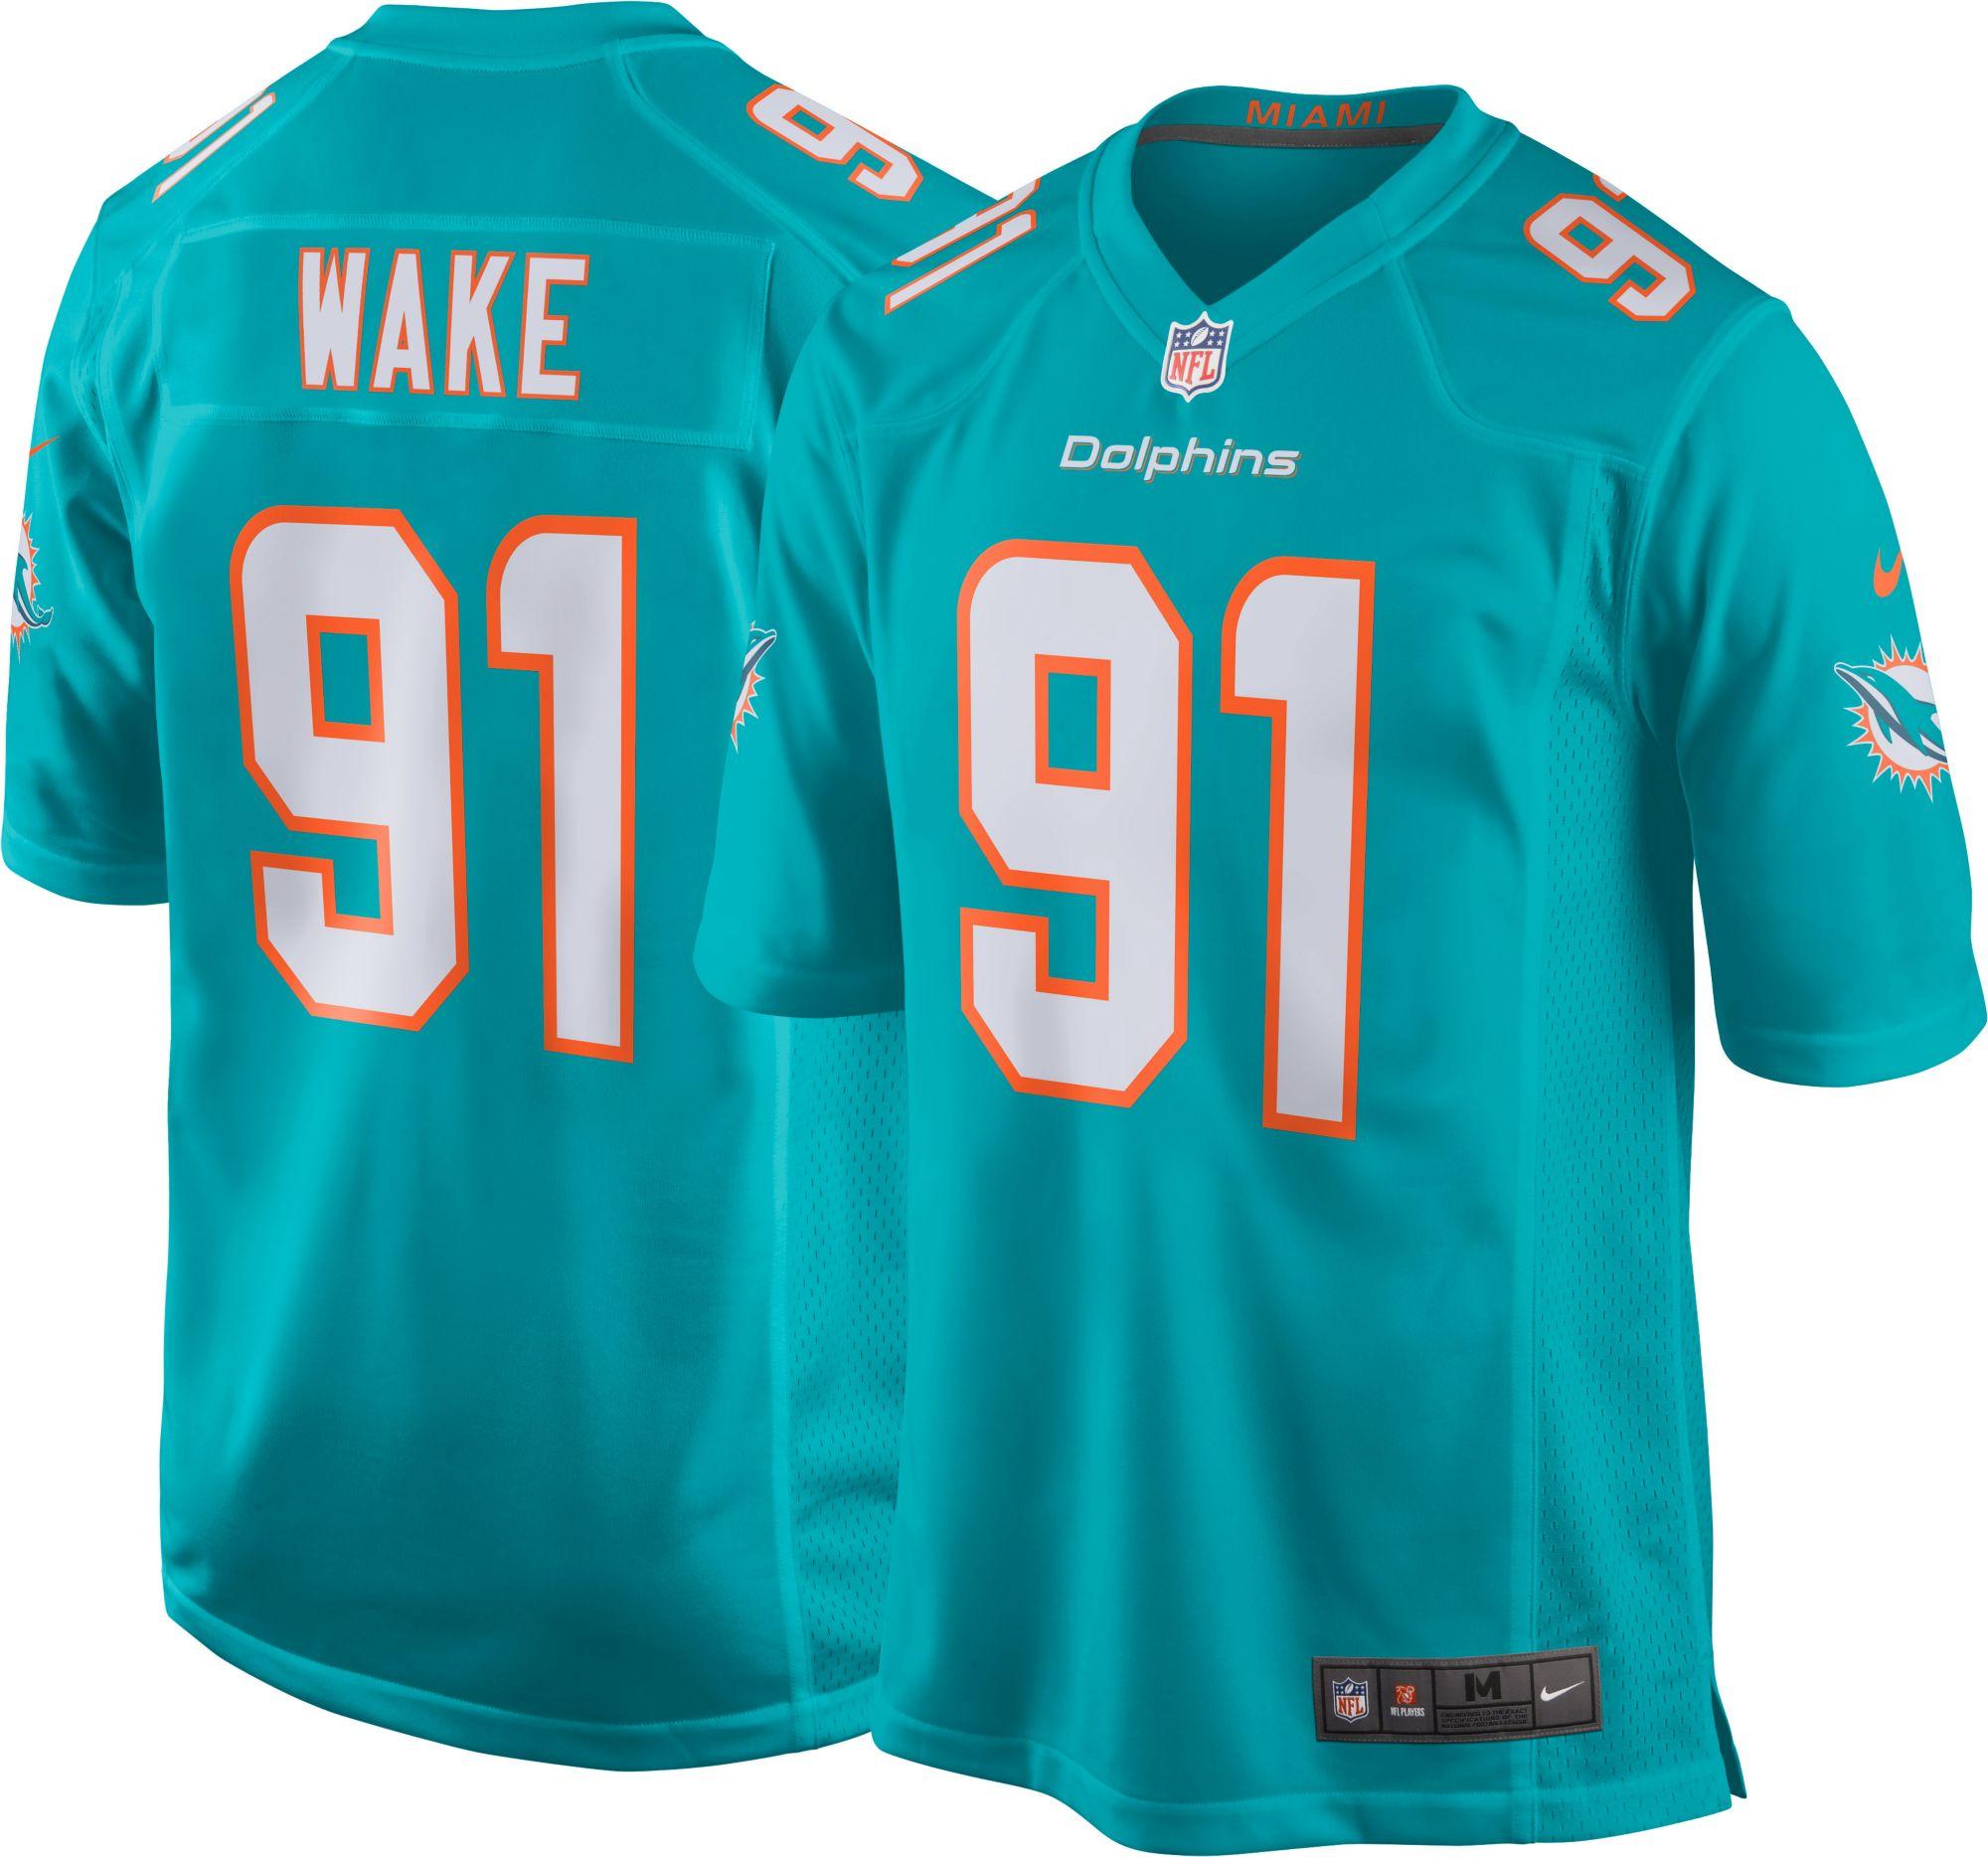 miami dolphins jersey cameron wake